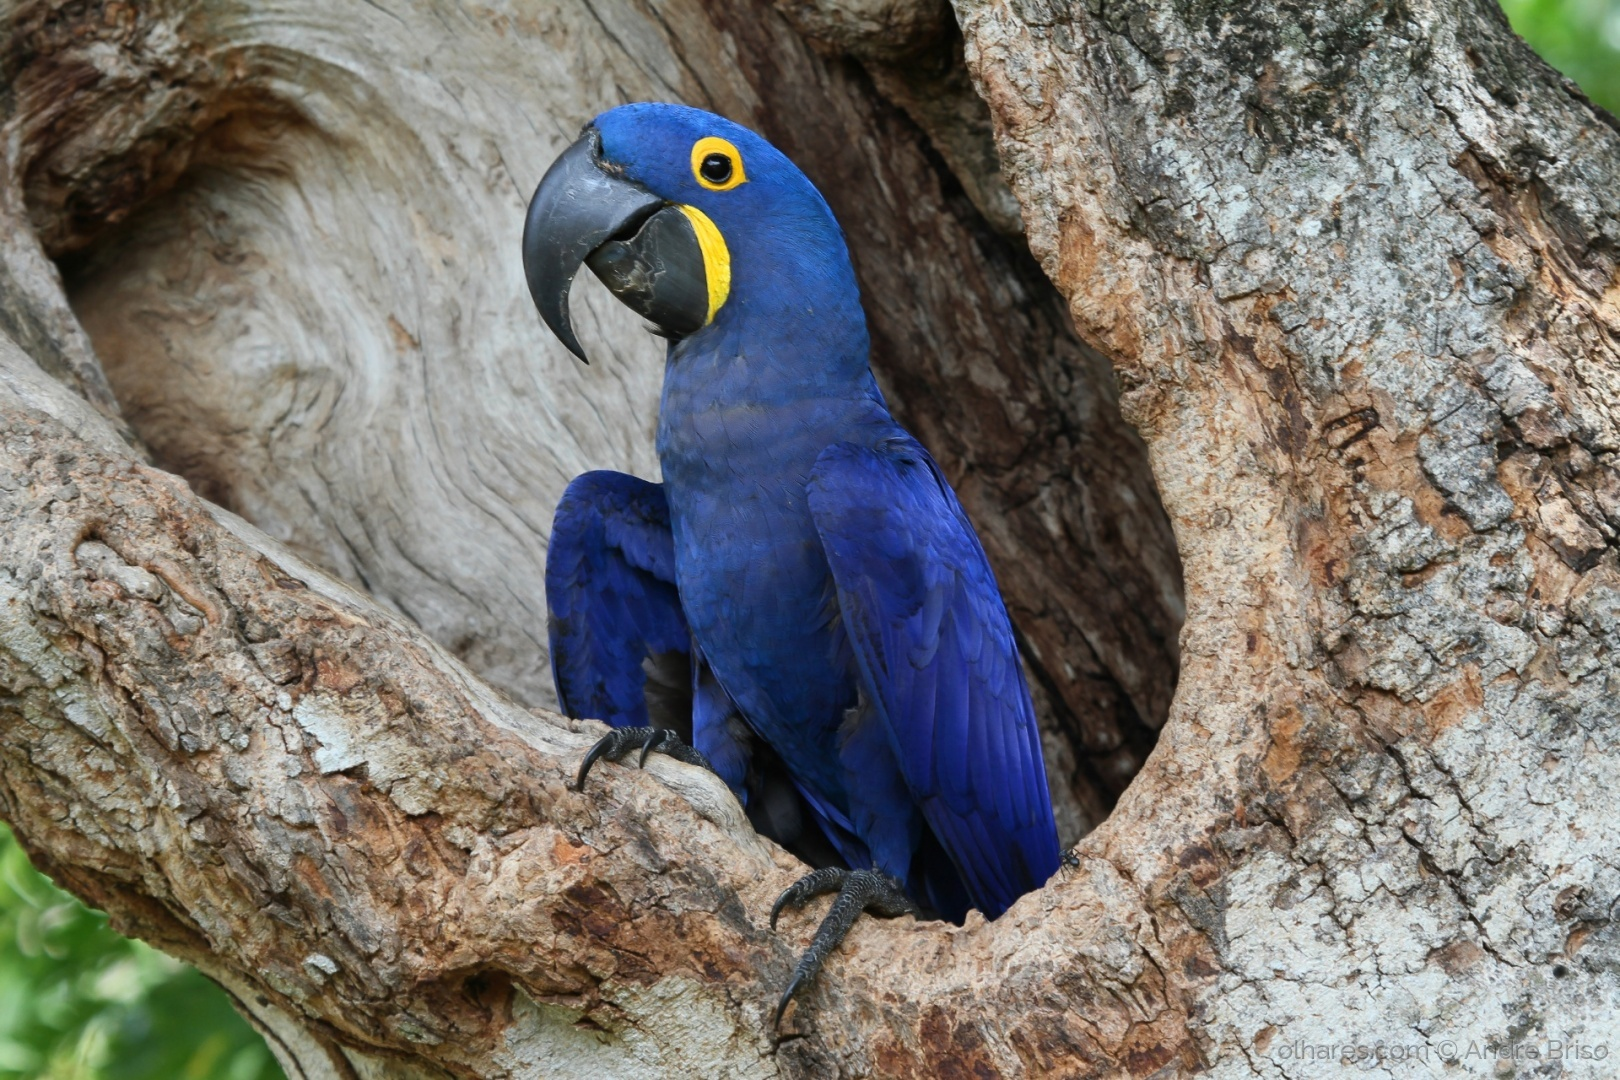 Animais extintos no Brasil